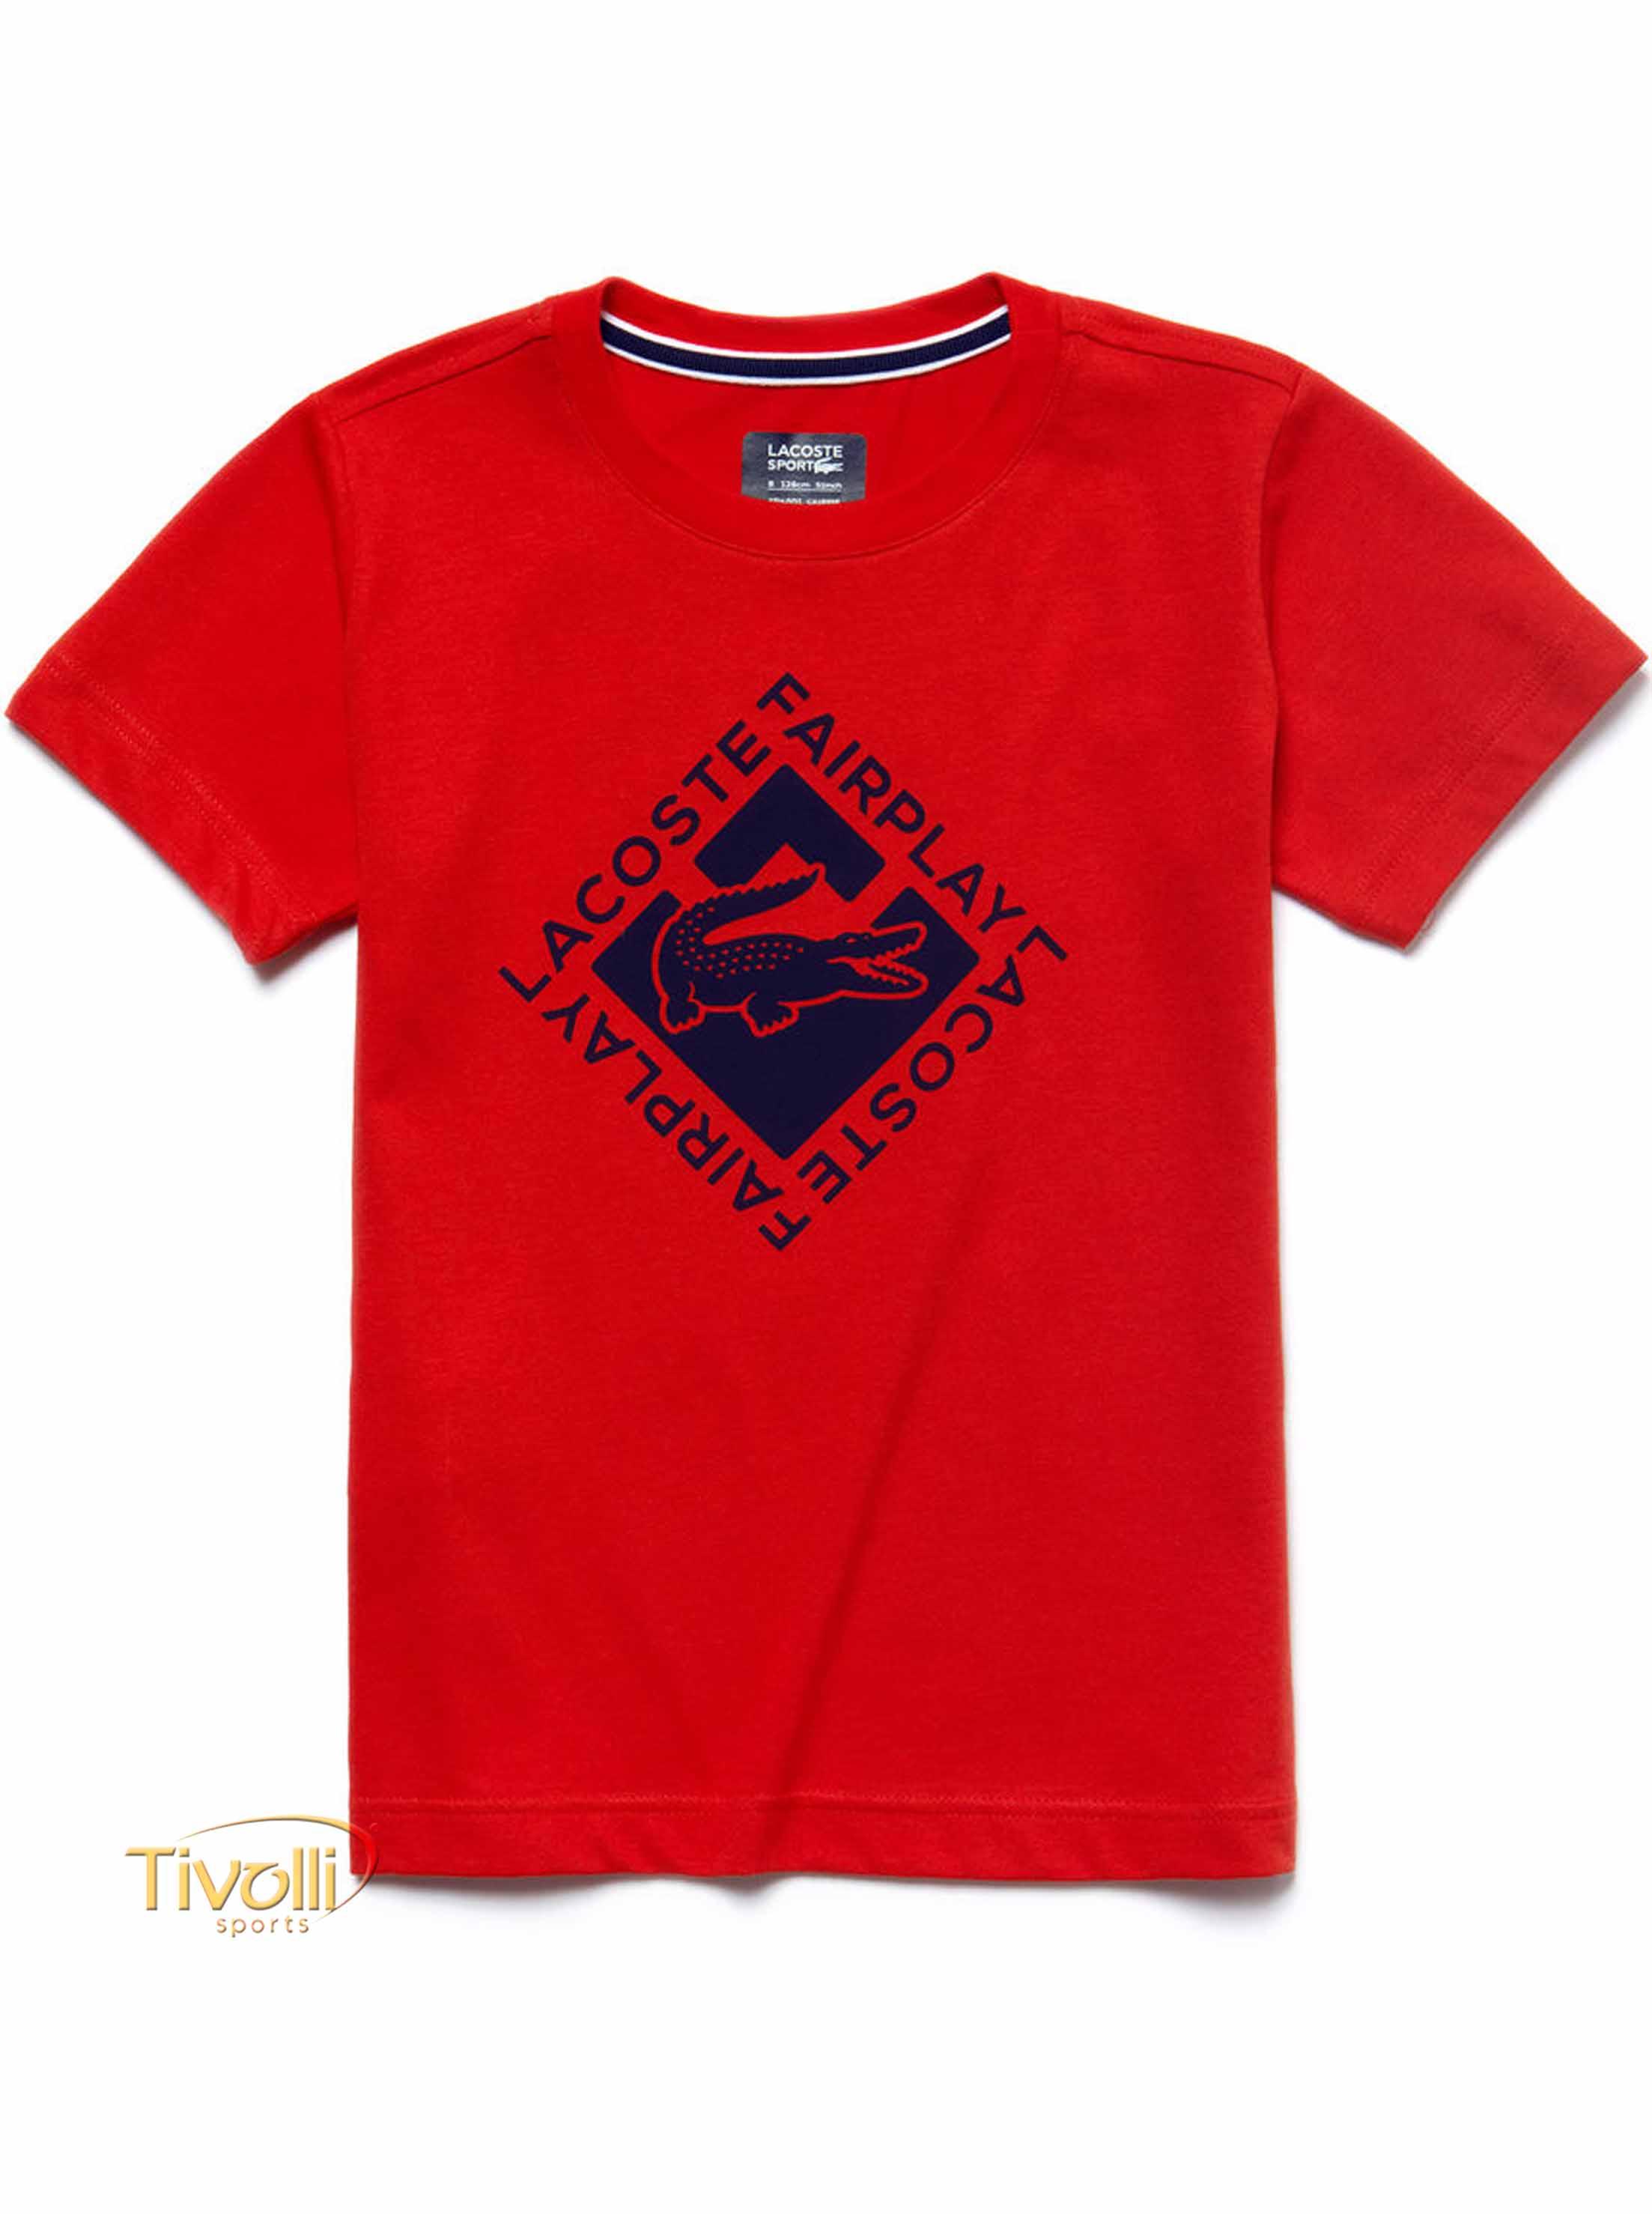 4bdc096daa8 Raquete Mania   Camiseta Lacoste   Fair Play Vermelha Estampada